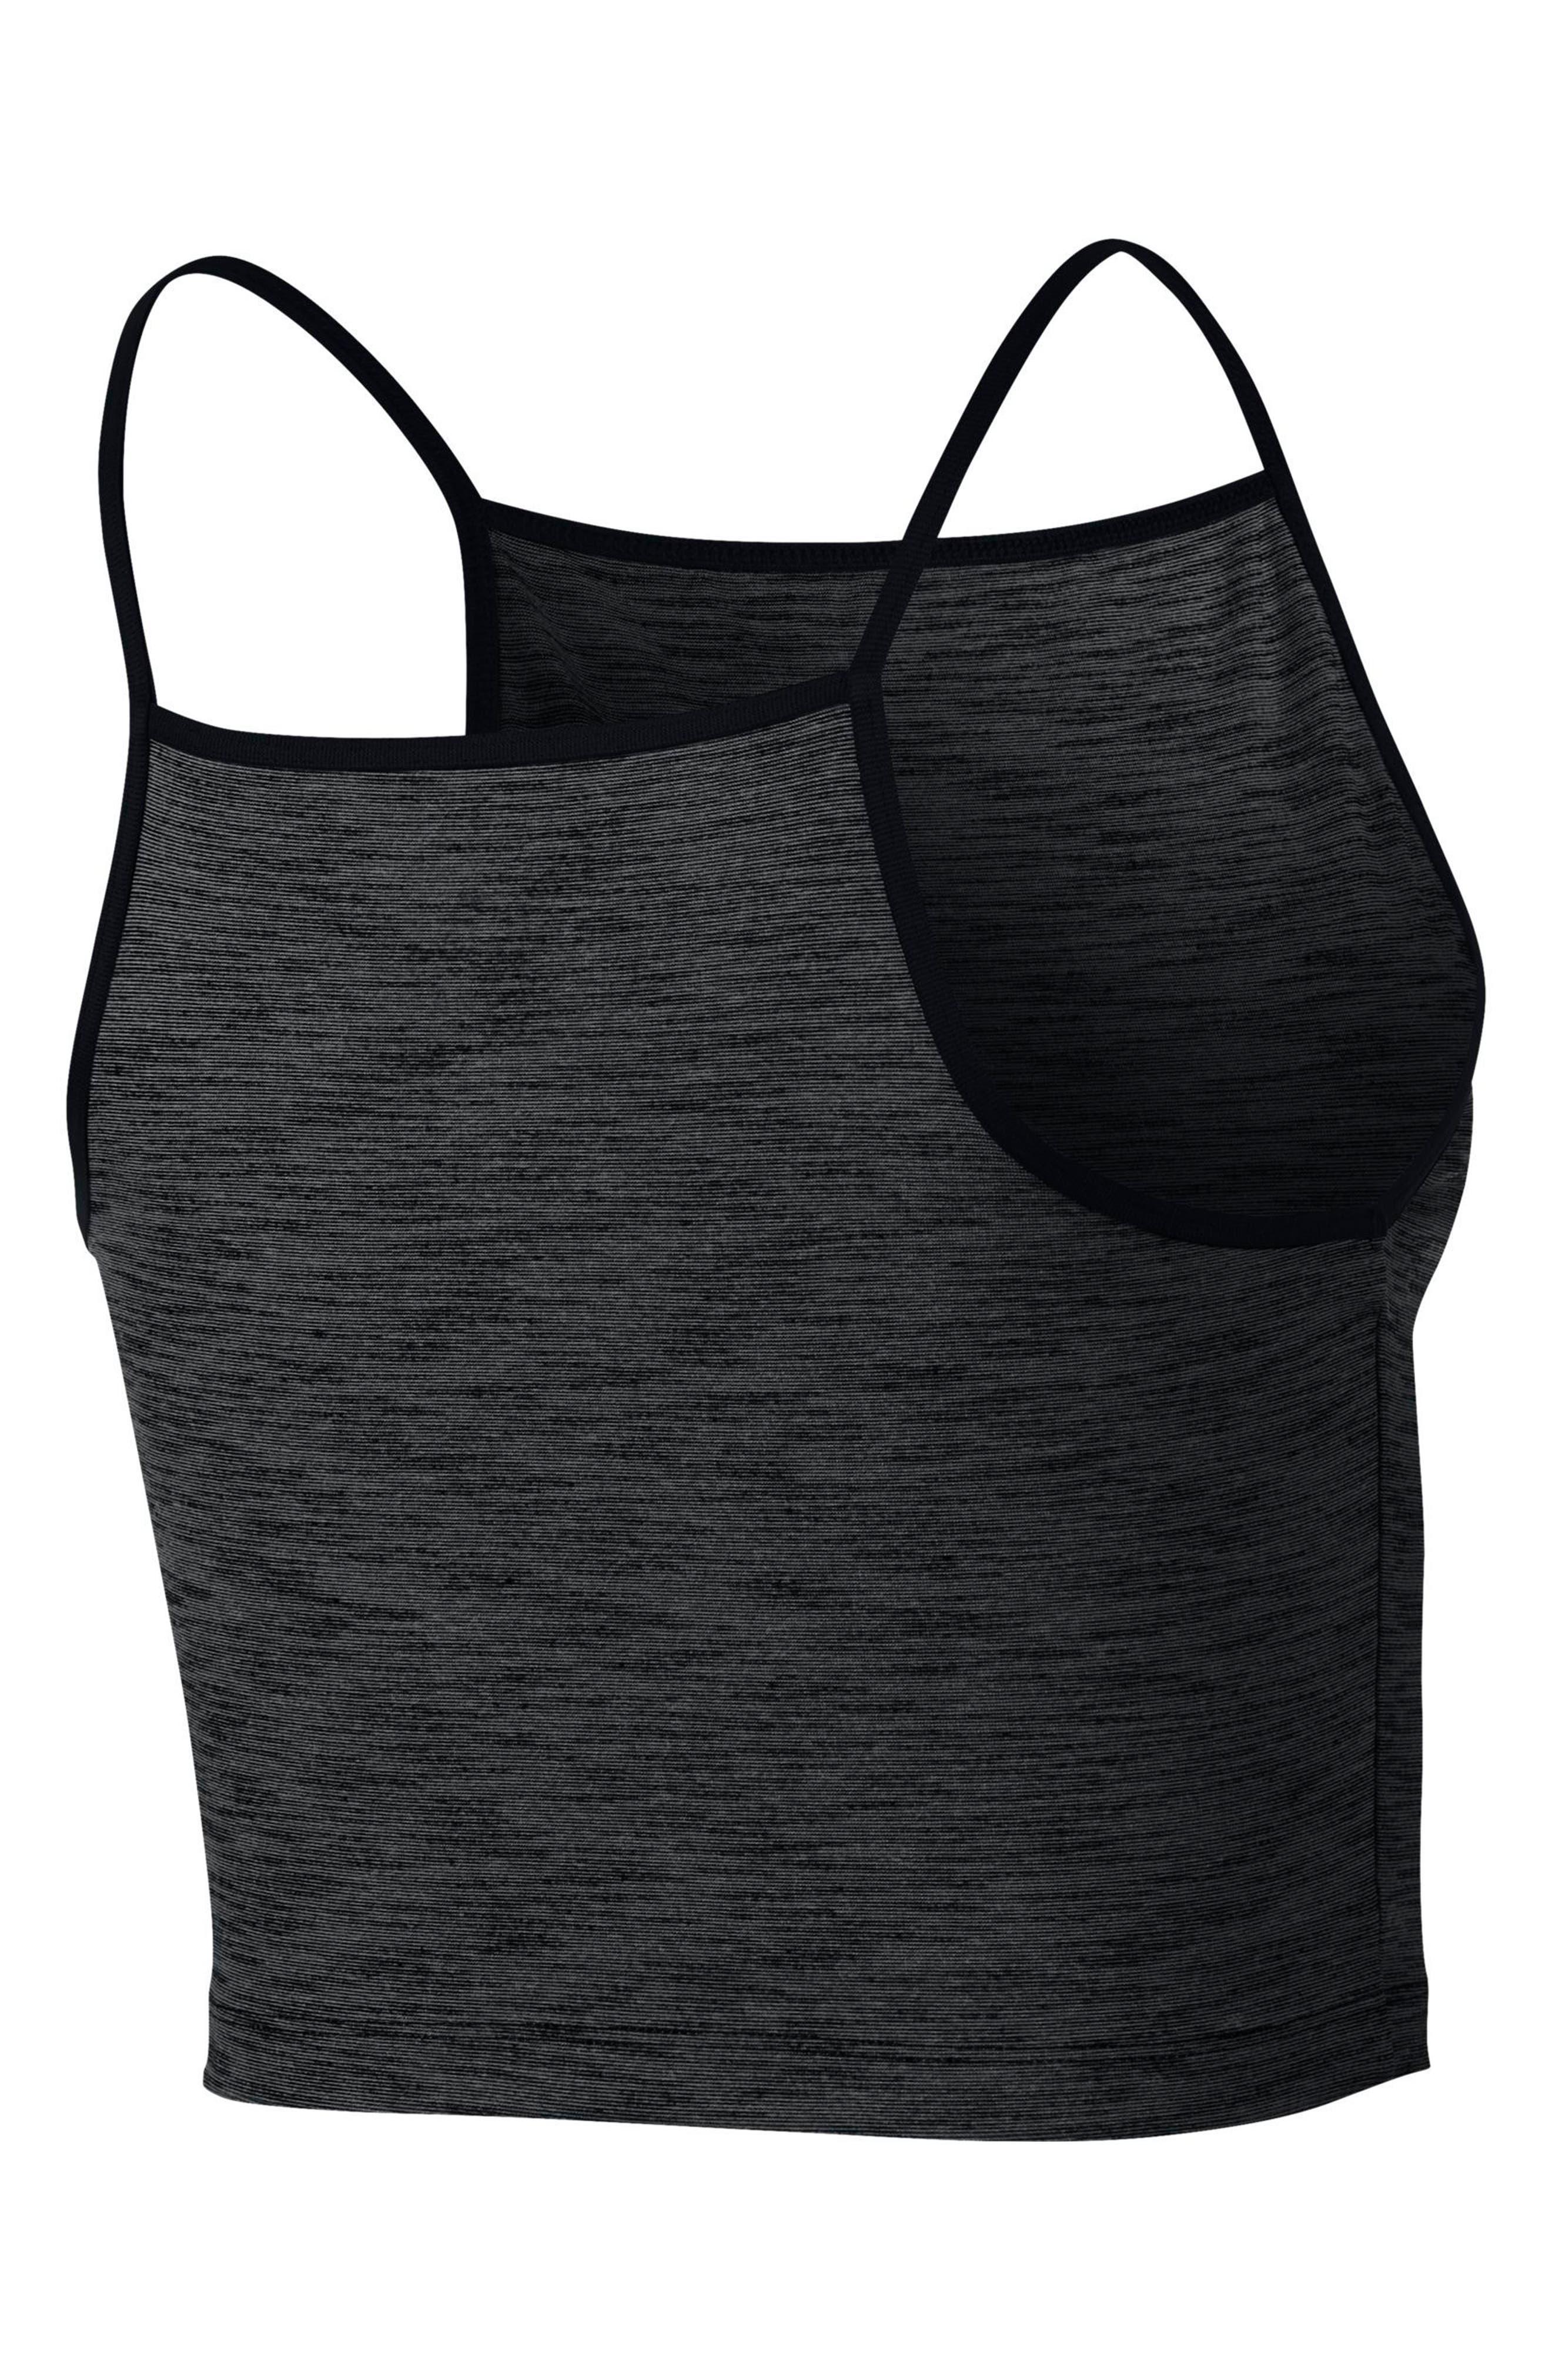 Power Women's Dry Training Tank,                             Alternate thumbnail 2, color,                             Black/ Heather/ Black